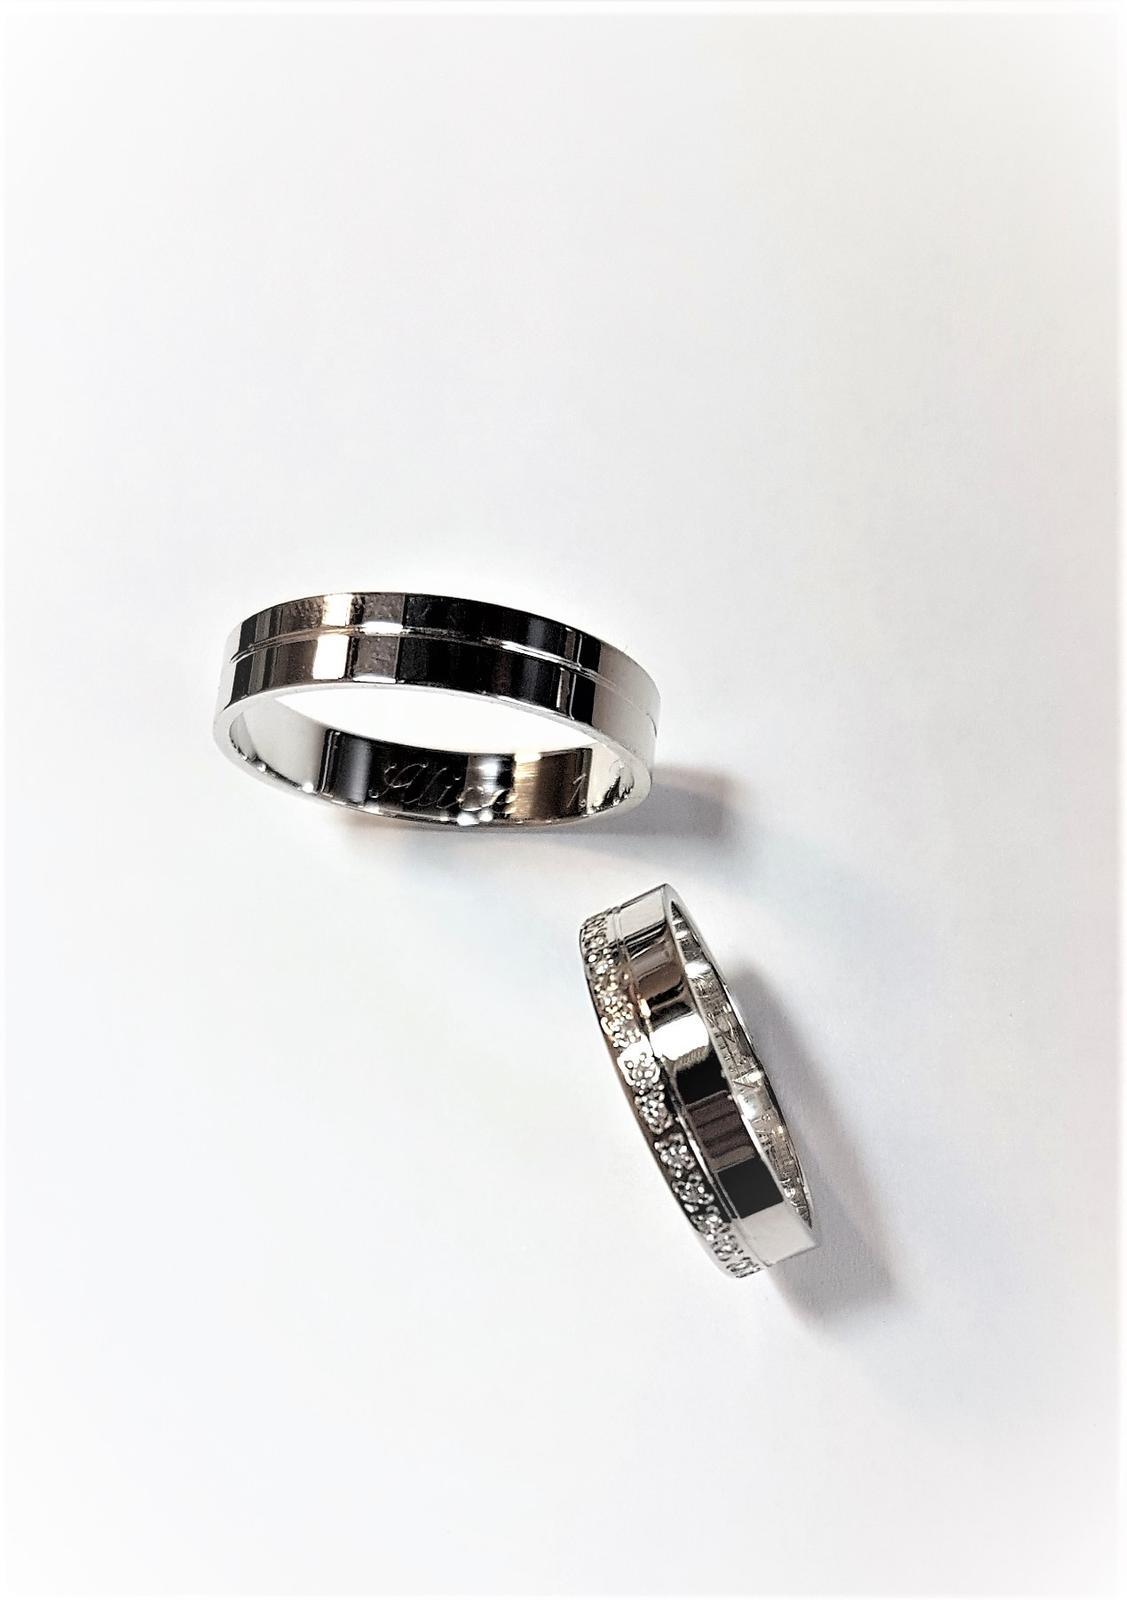 Máj lásky a svateb čas :-) - Obrázek č. 3